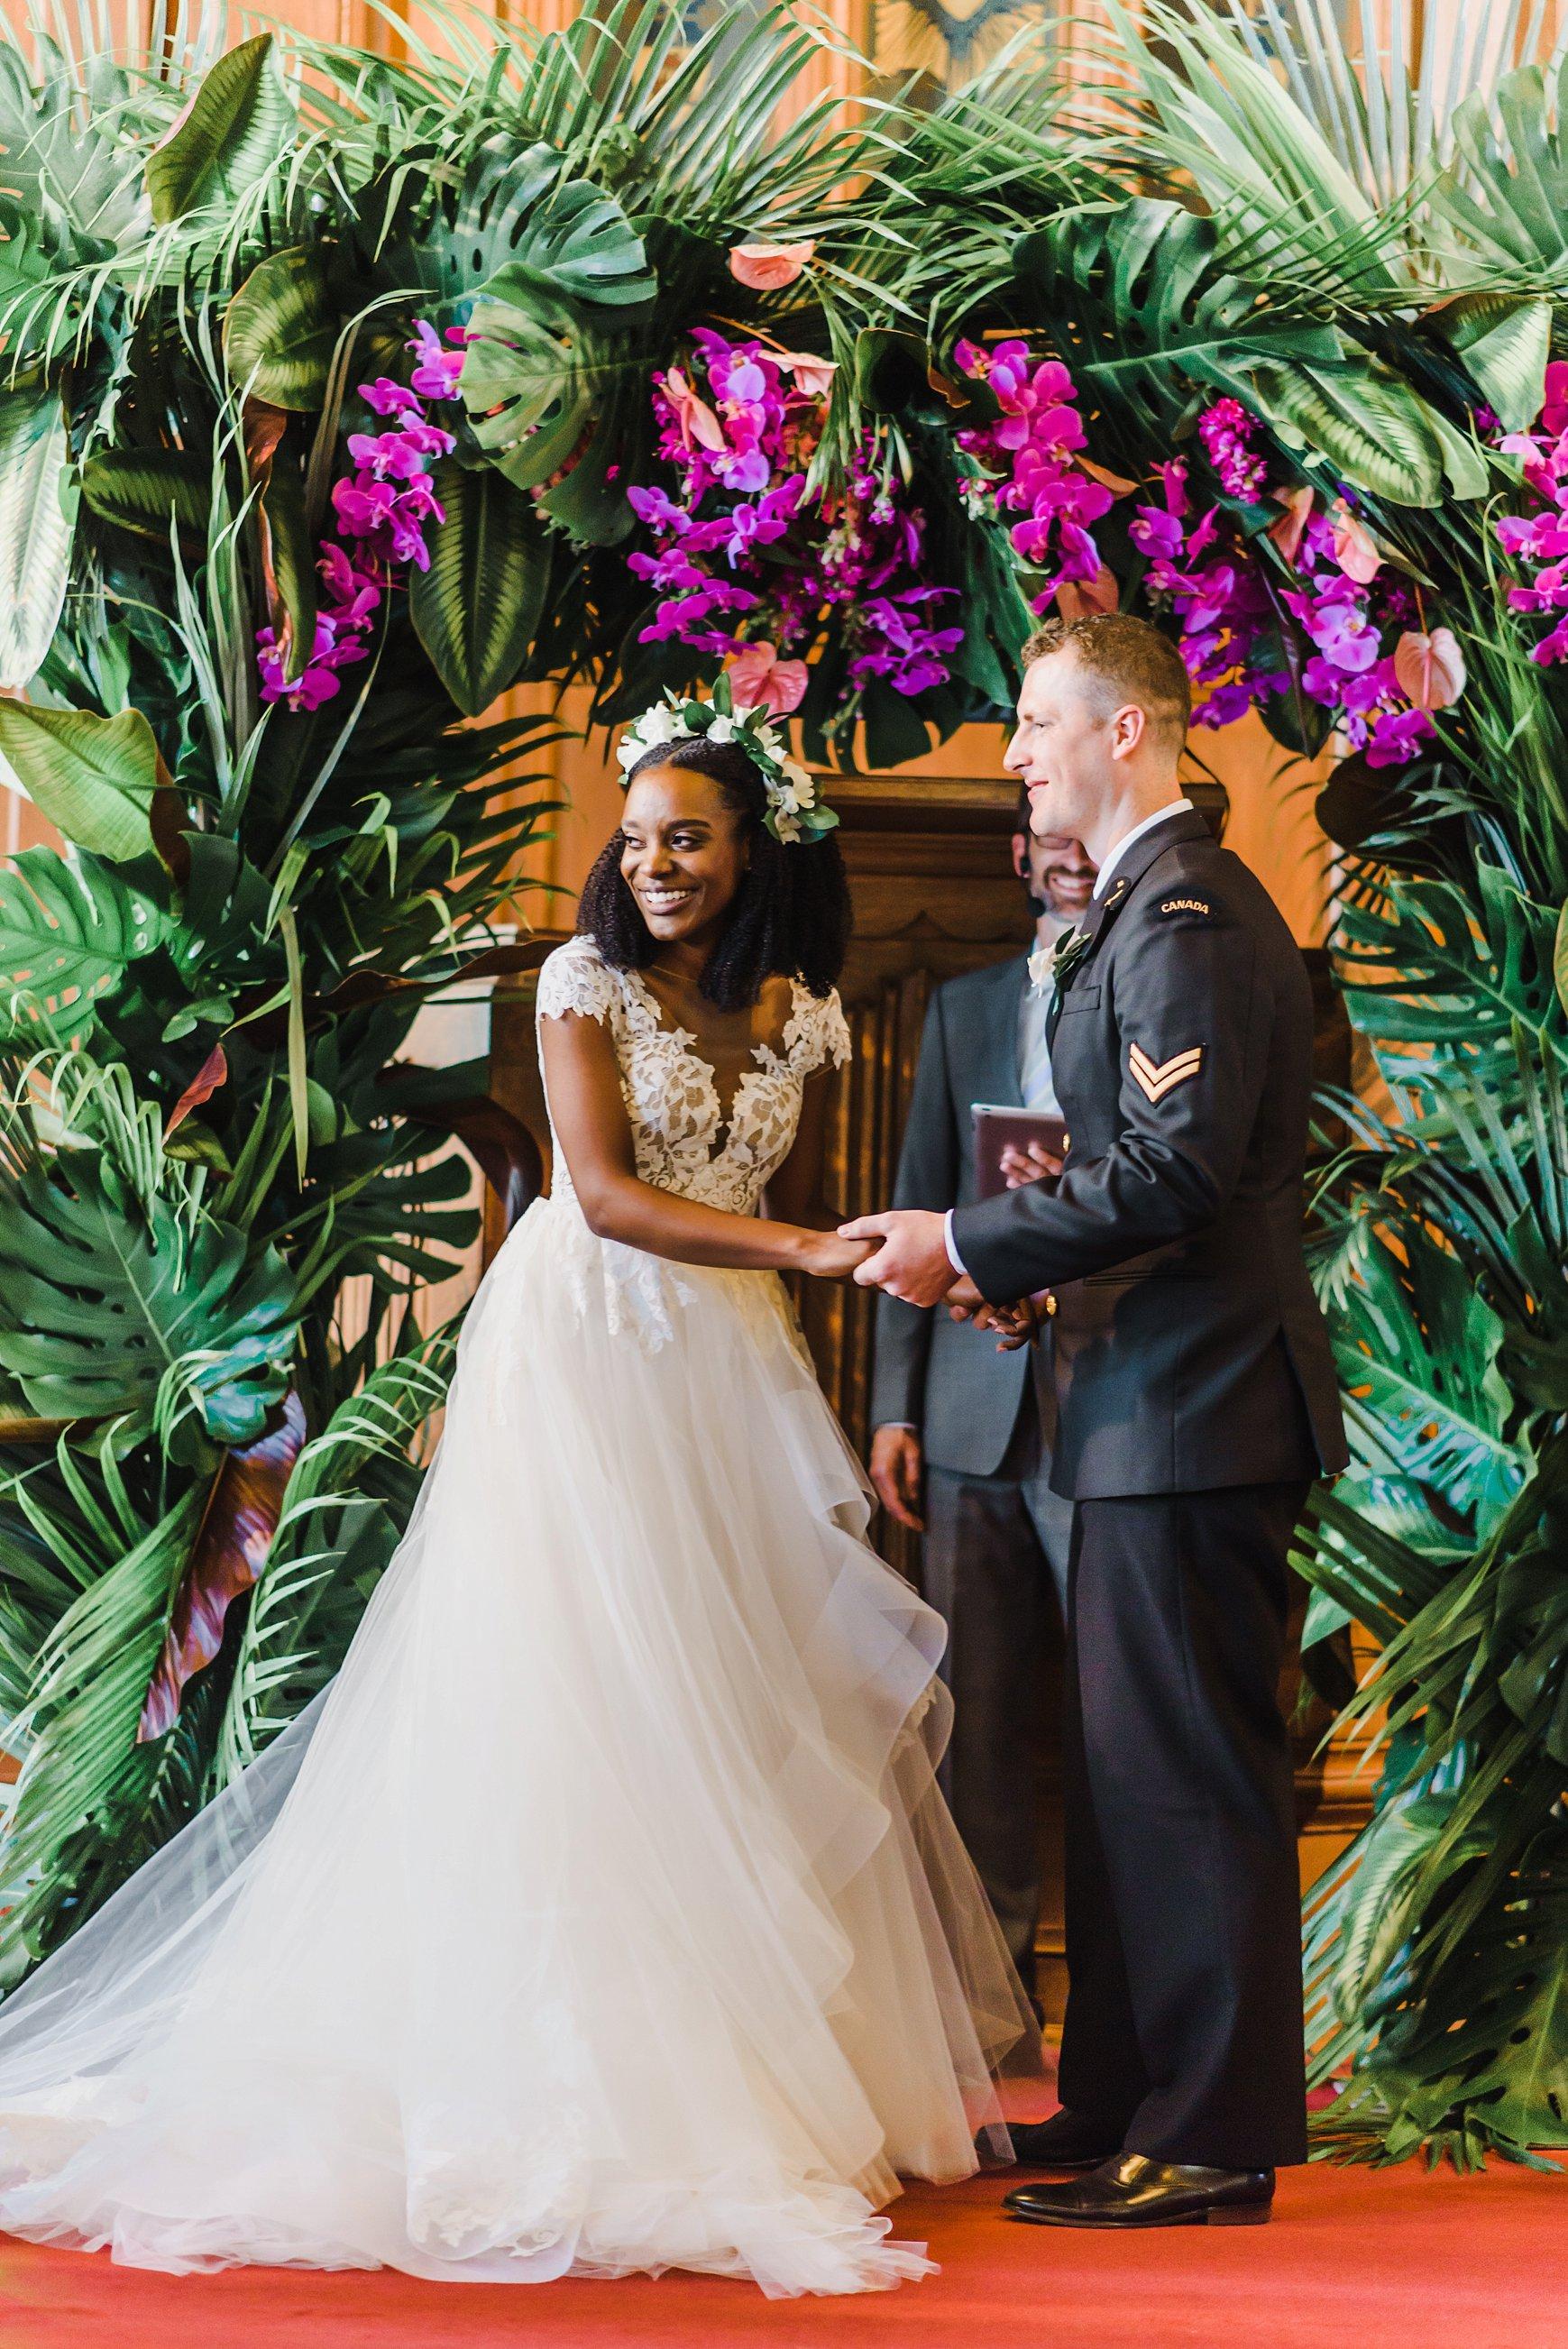 light airy indie fine art ottawa wedding photographer | Ali and Batoul Photography_0977.jpg